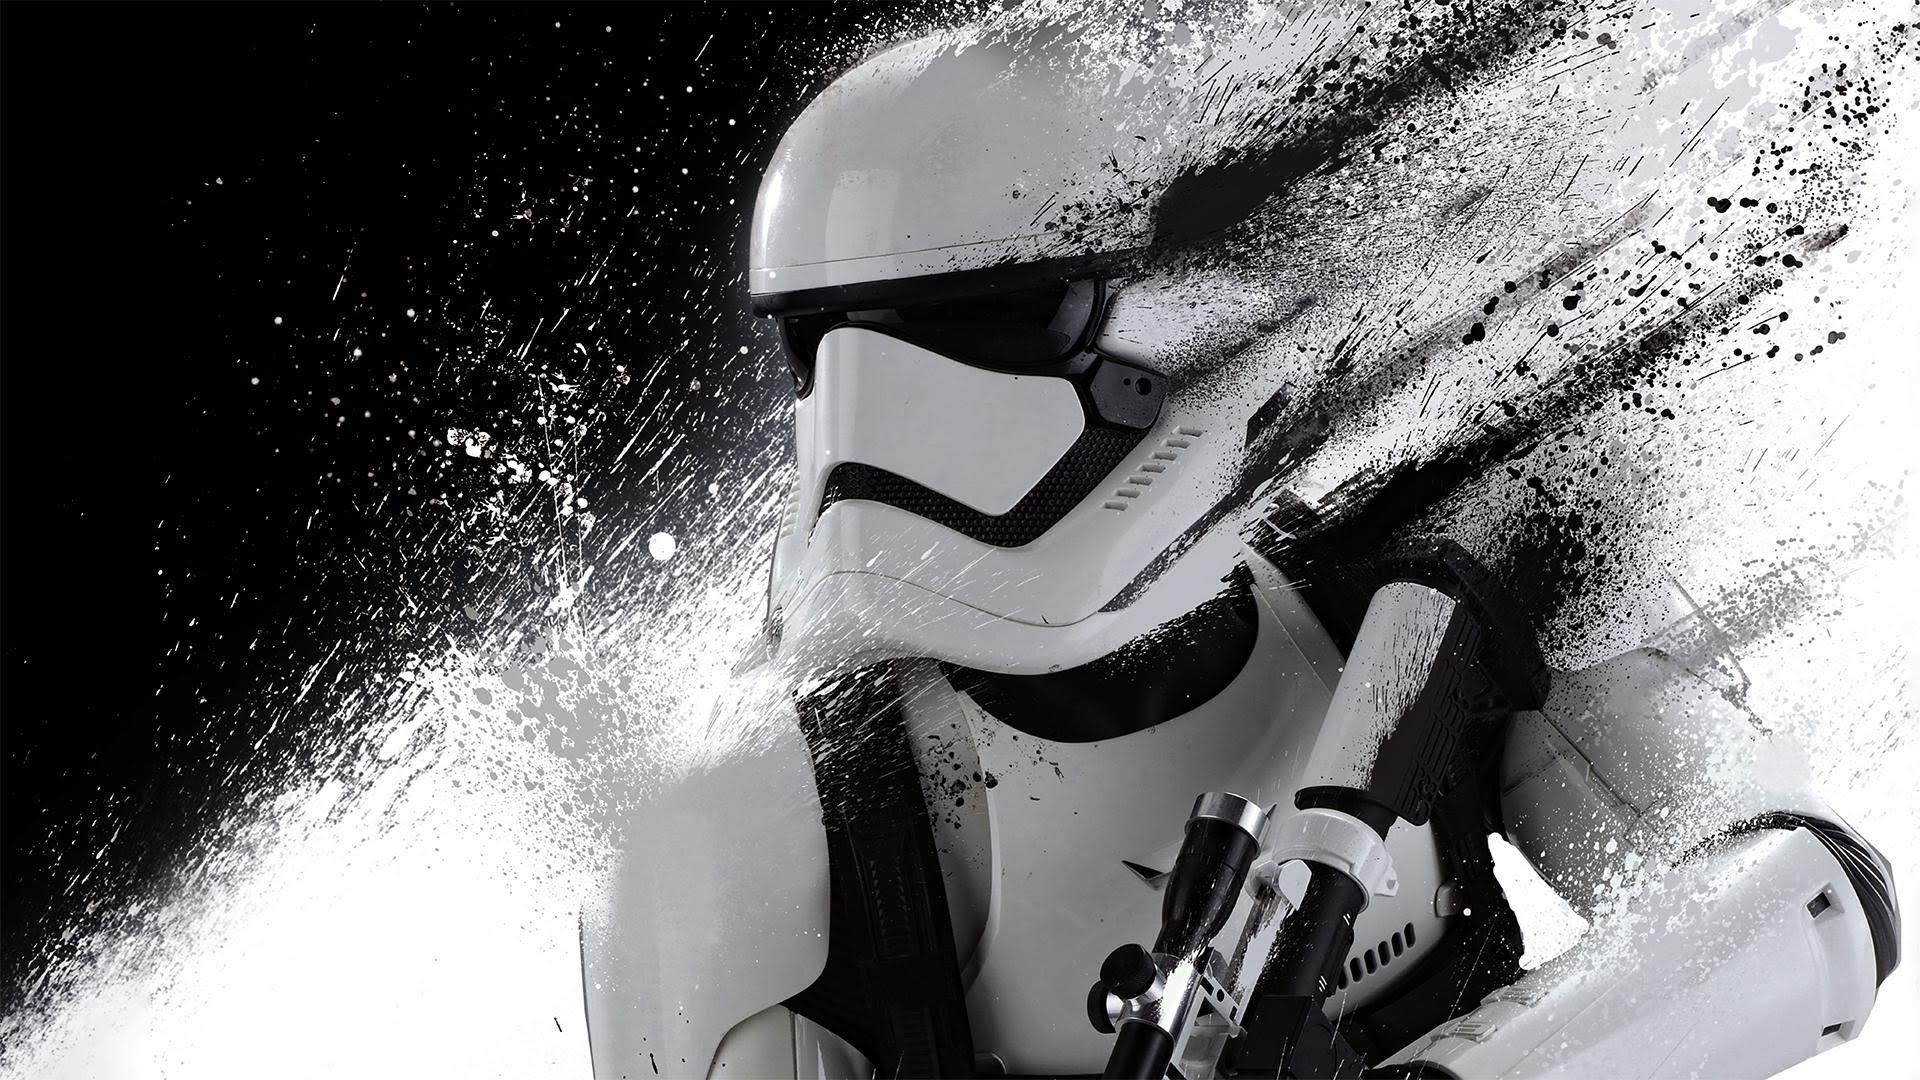 Wallpapers Of Star Wars Stormtrooper Wallpaper 4k 1920x1080 Wallpaper Teahub Io